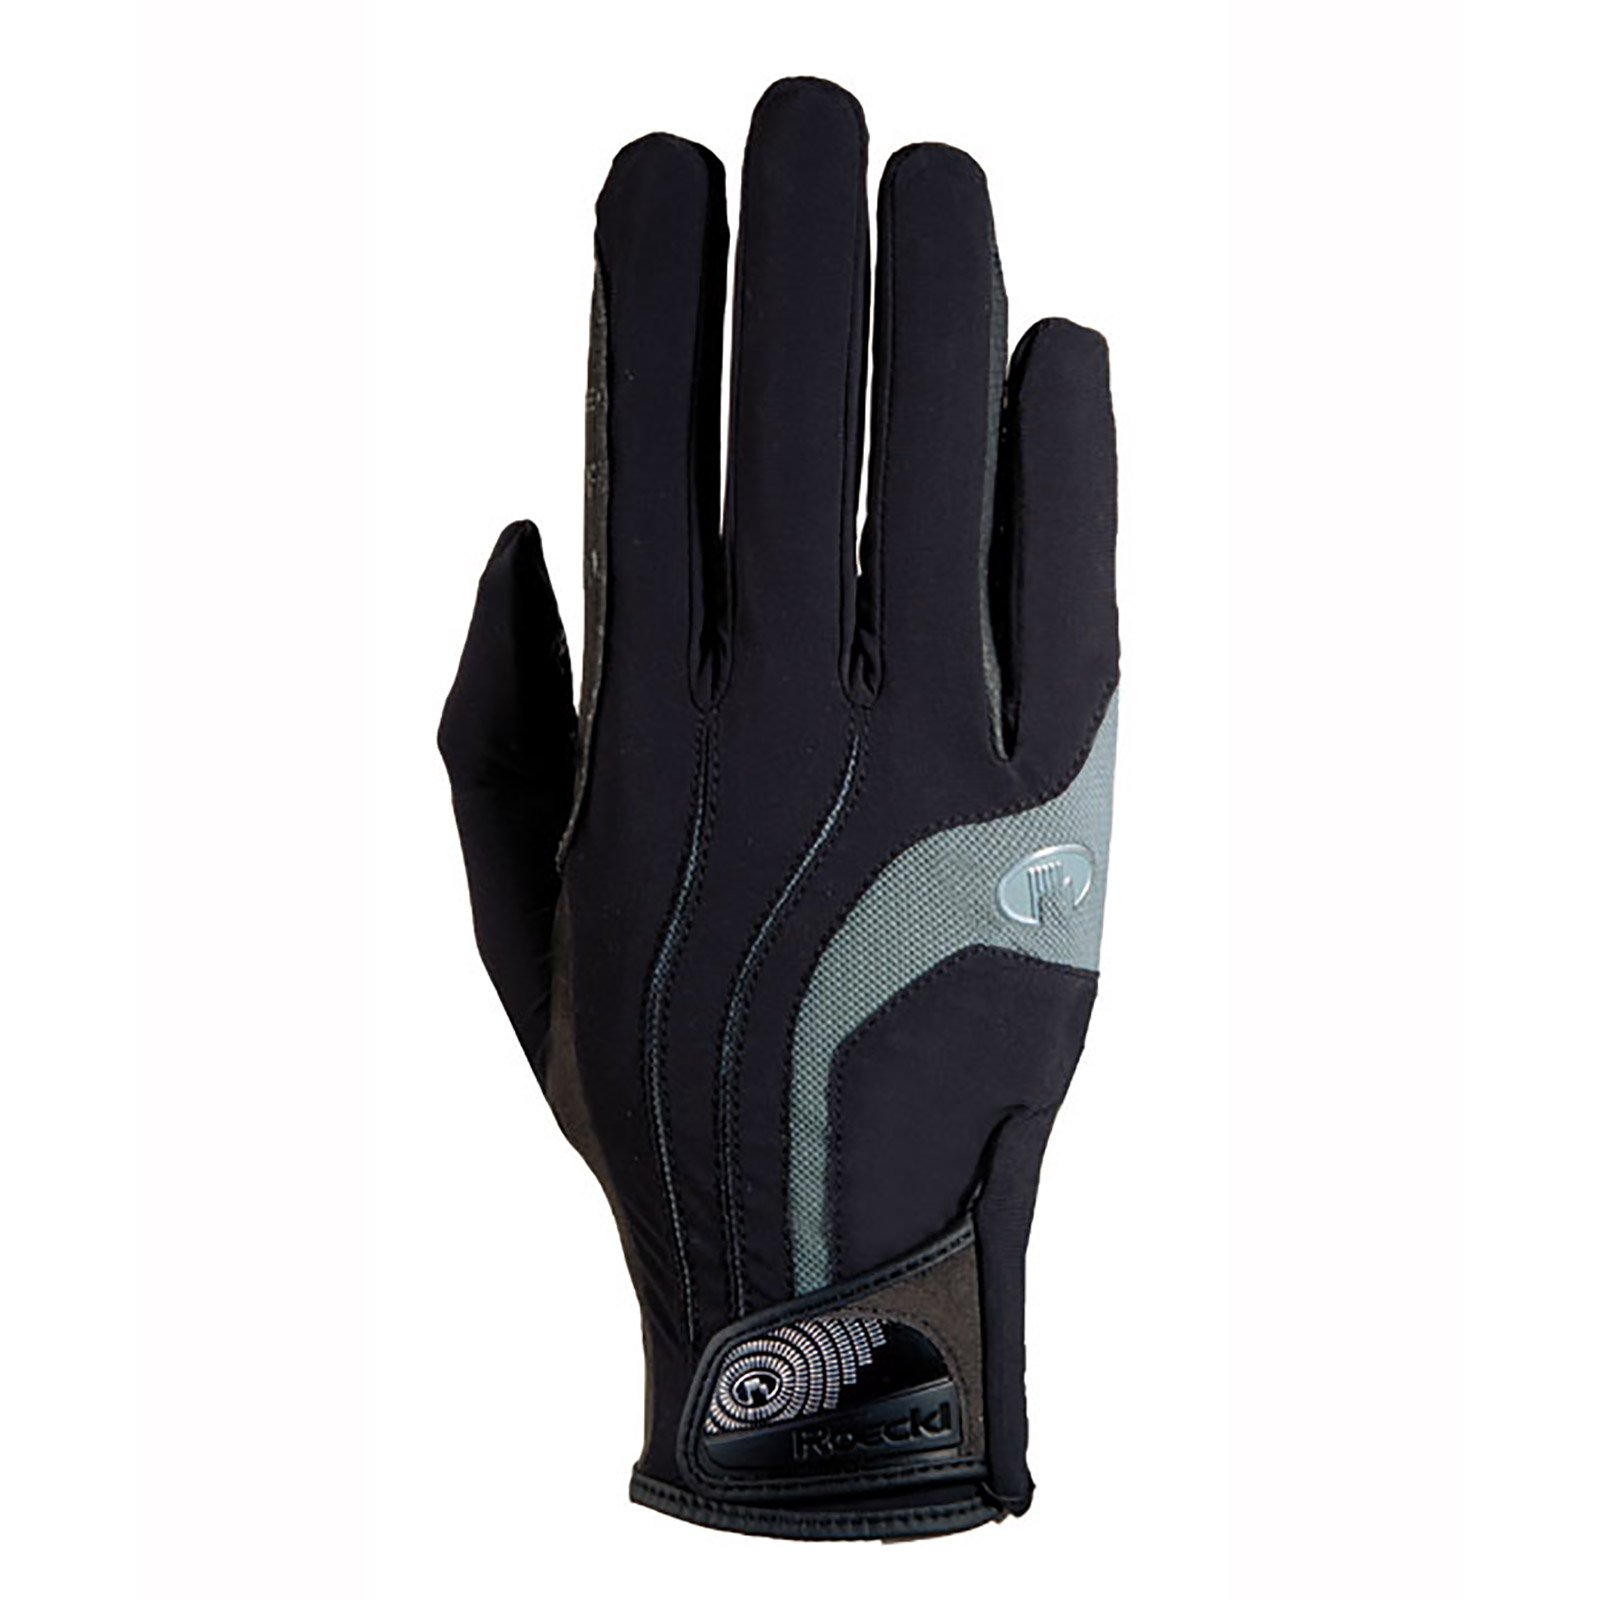 Roeckl Malia Riding Gloves Black/Grey 7